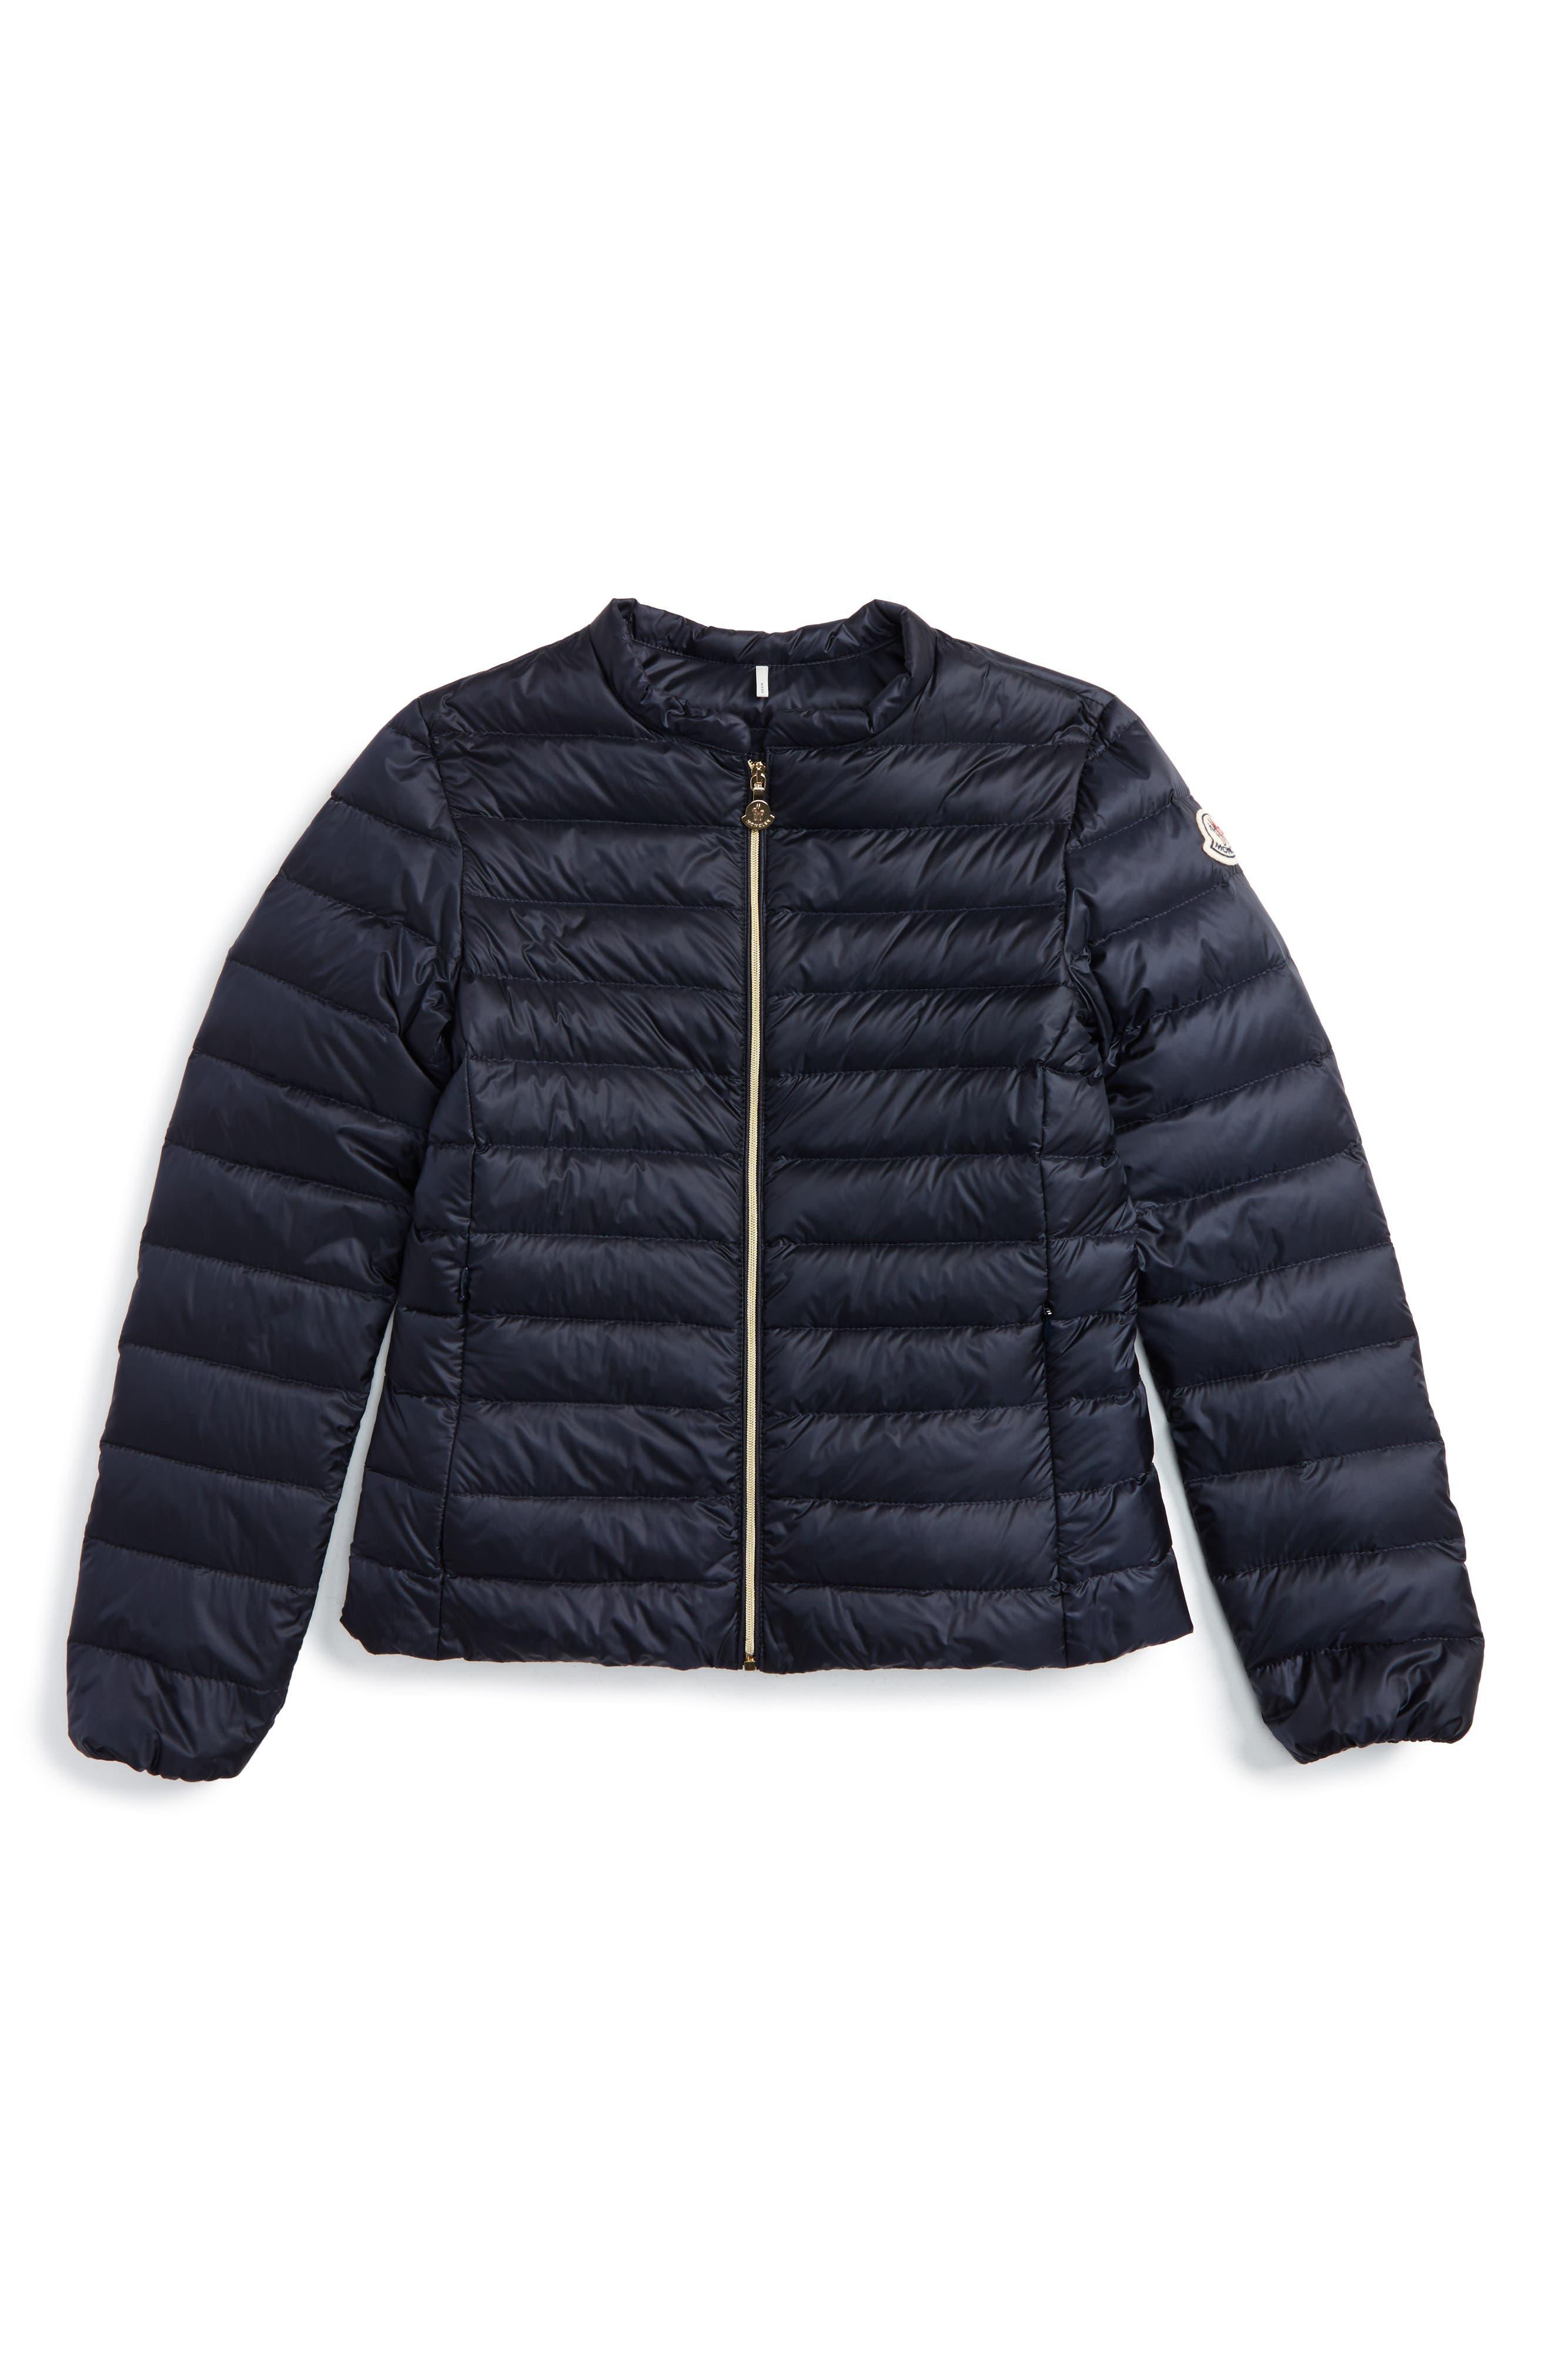 Alternate Image 1 Selected - Moncler Ambrine Water Resistant Down Jacket (Toddler, Little Kid & Big Kid)